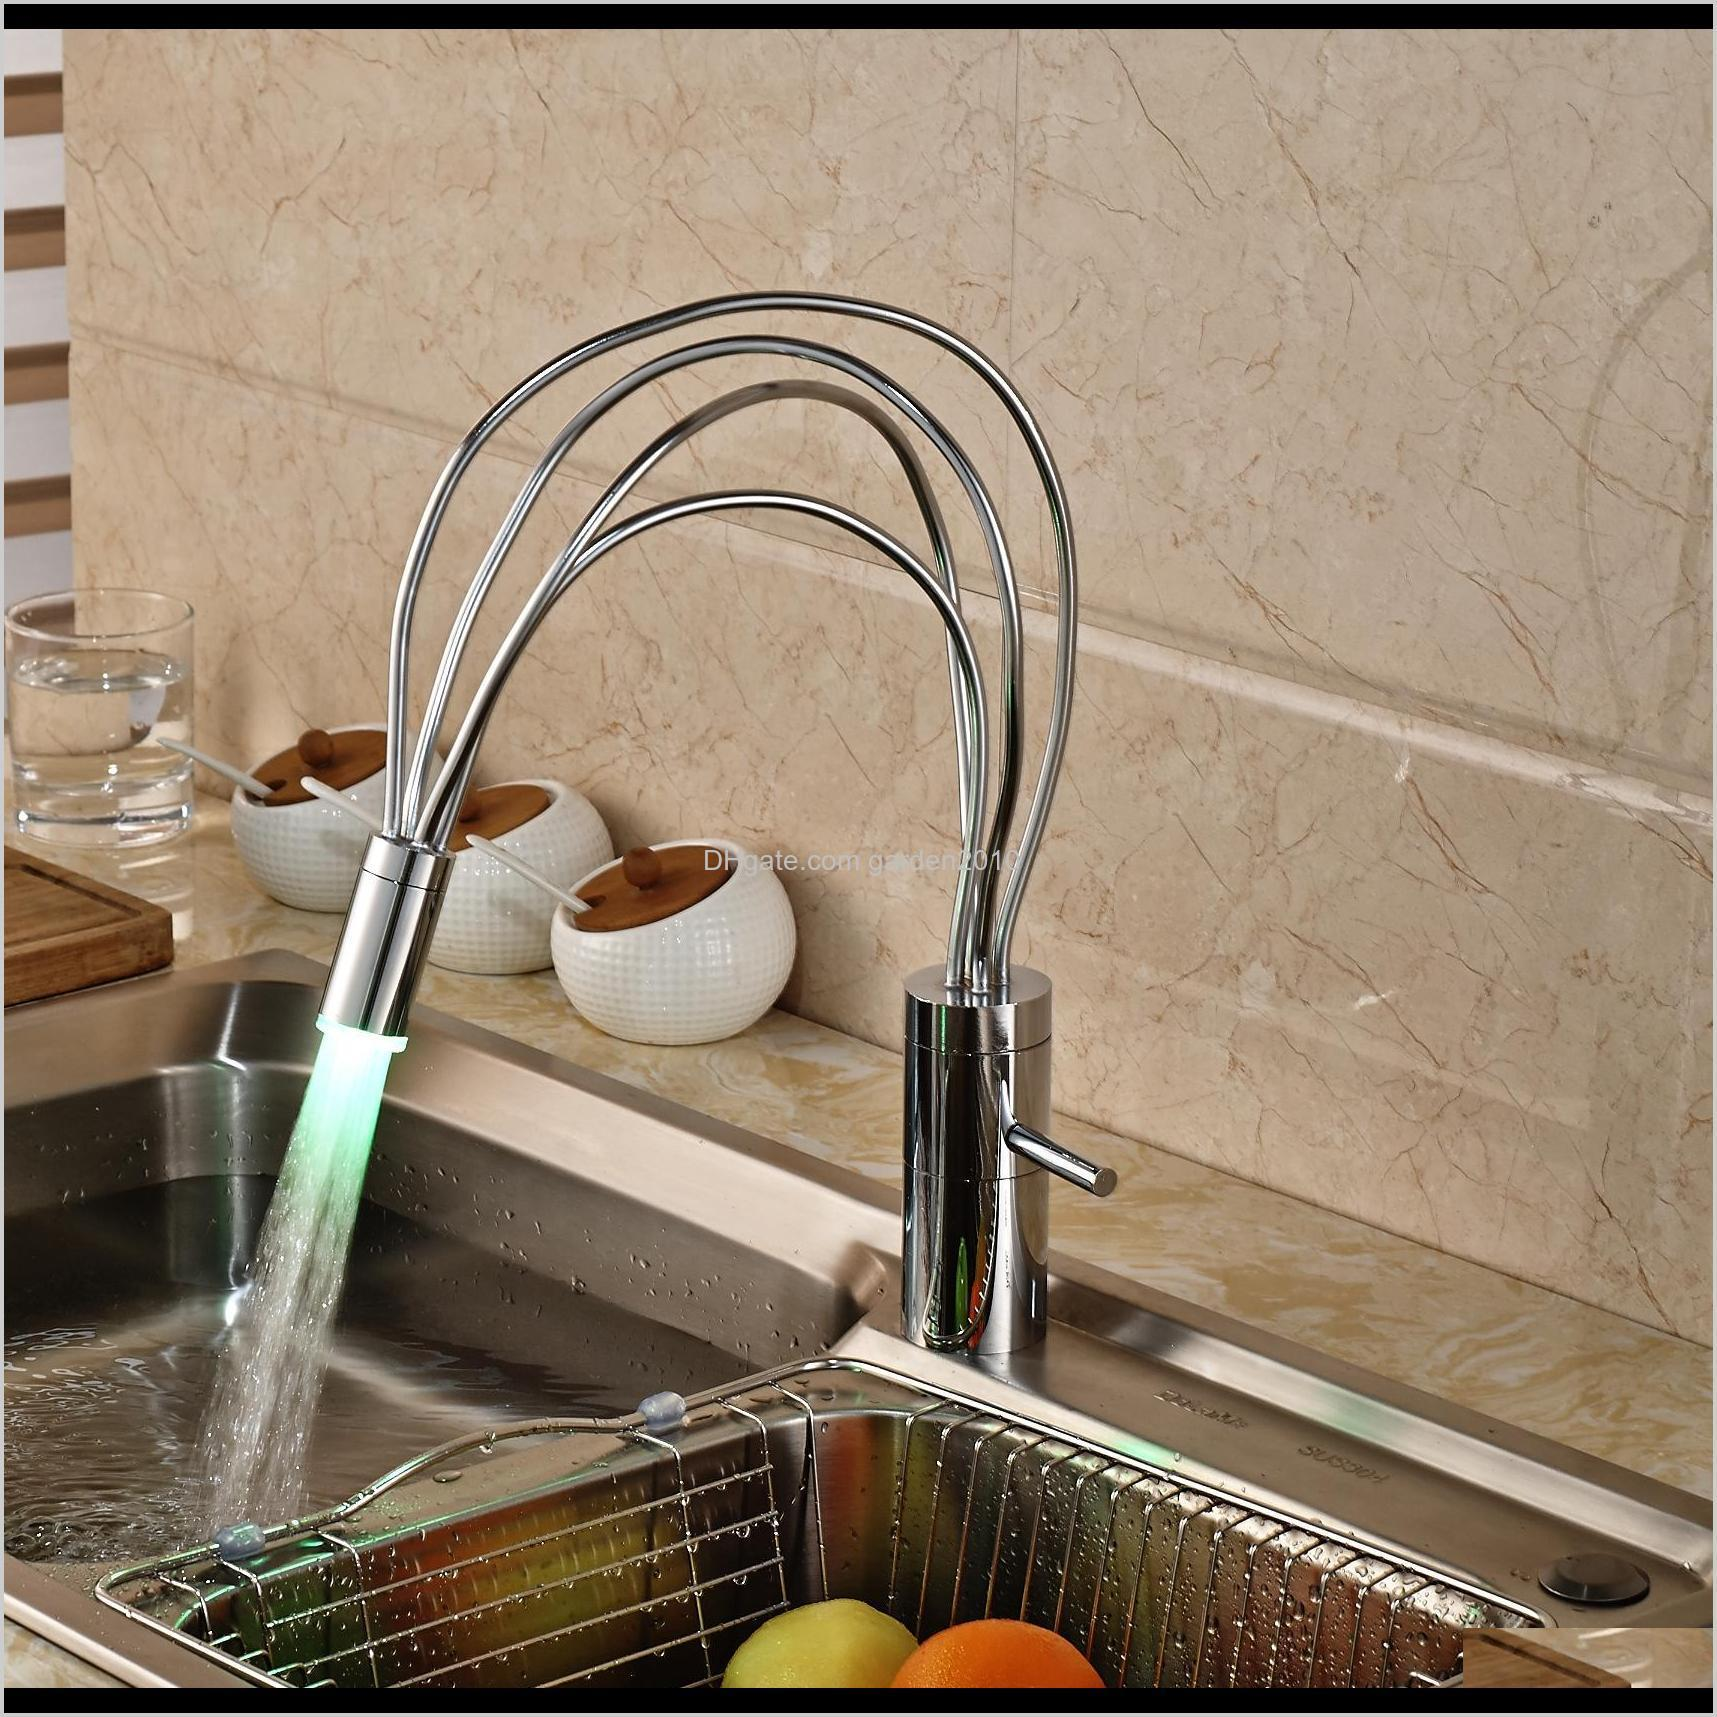 led color changing chrome brass kitchen faucet vantiy sink mixer tap single handle hole